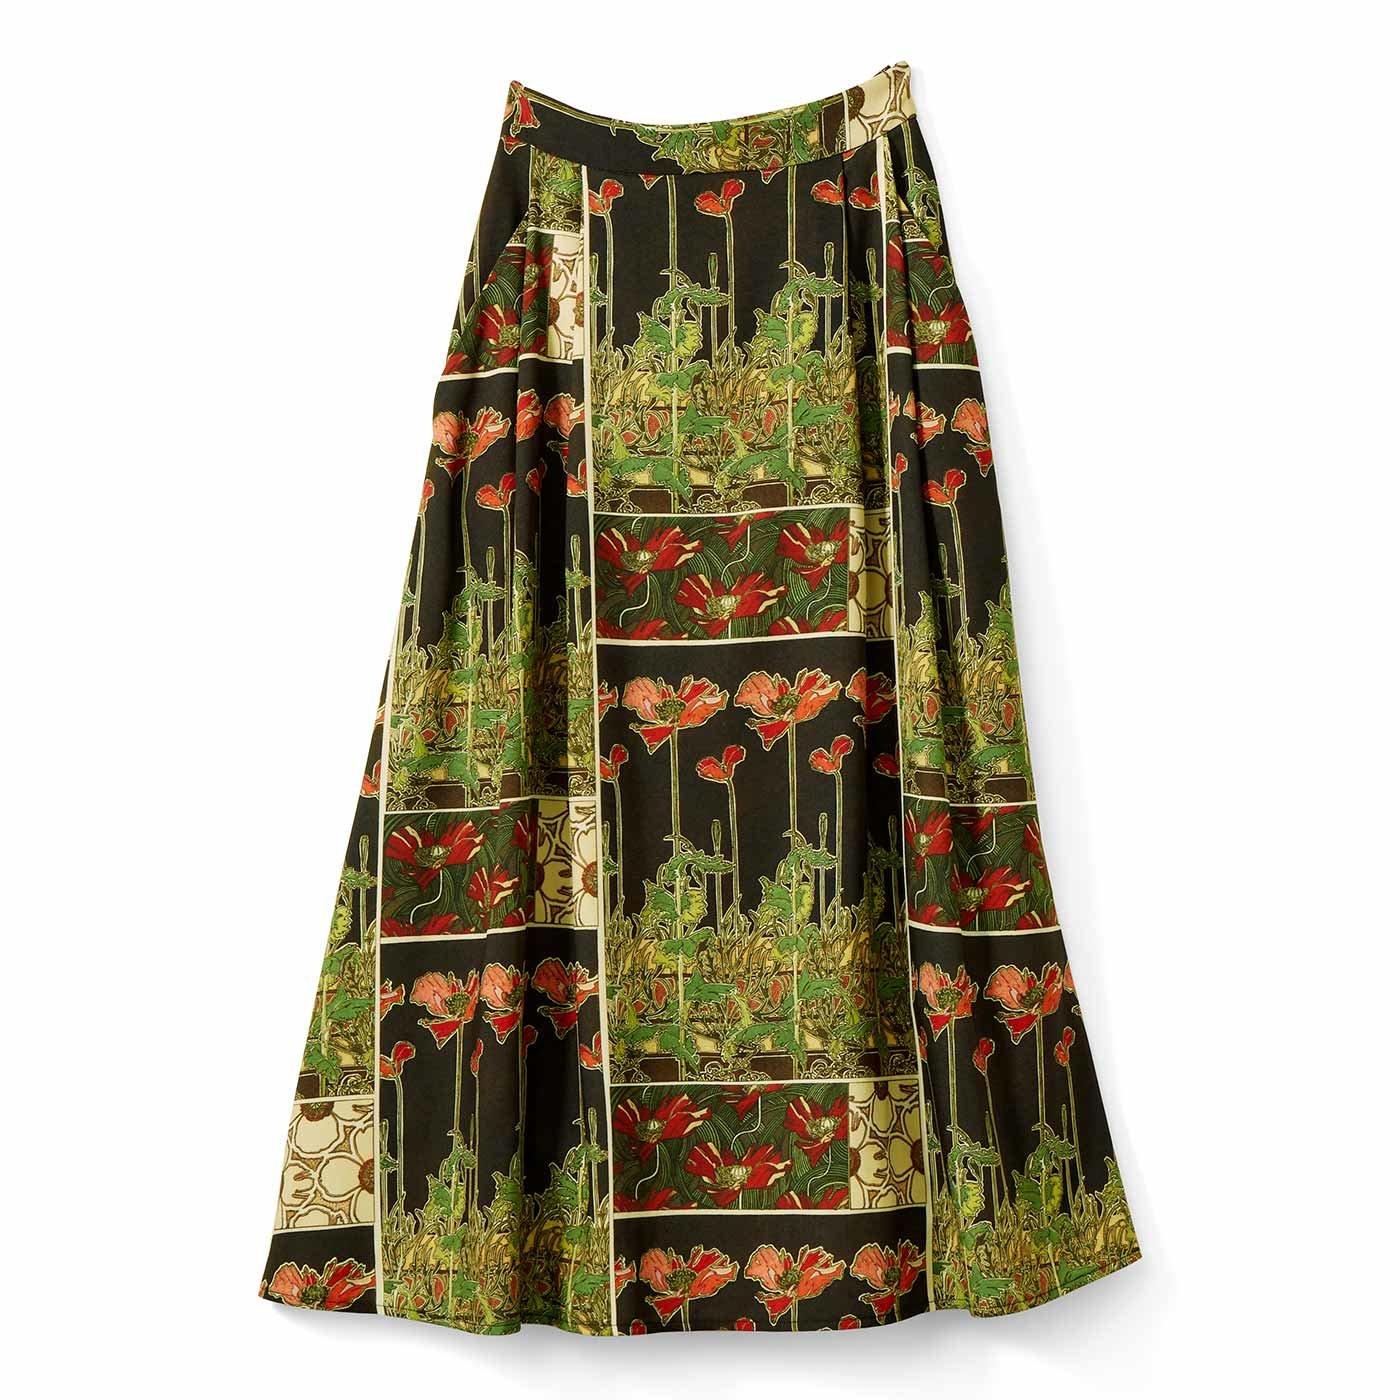 IEDIT[イディット] 優美なミュシャの図案をまとう クラッシックなプリントスカート〈ブラック〉